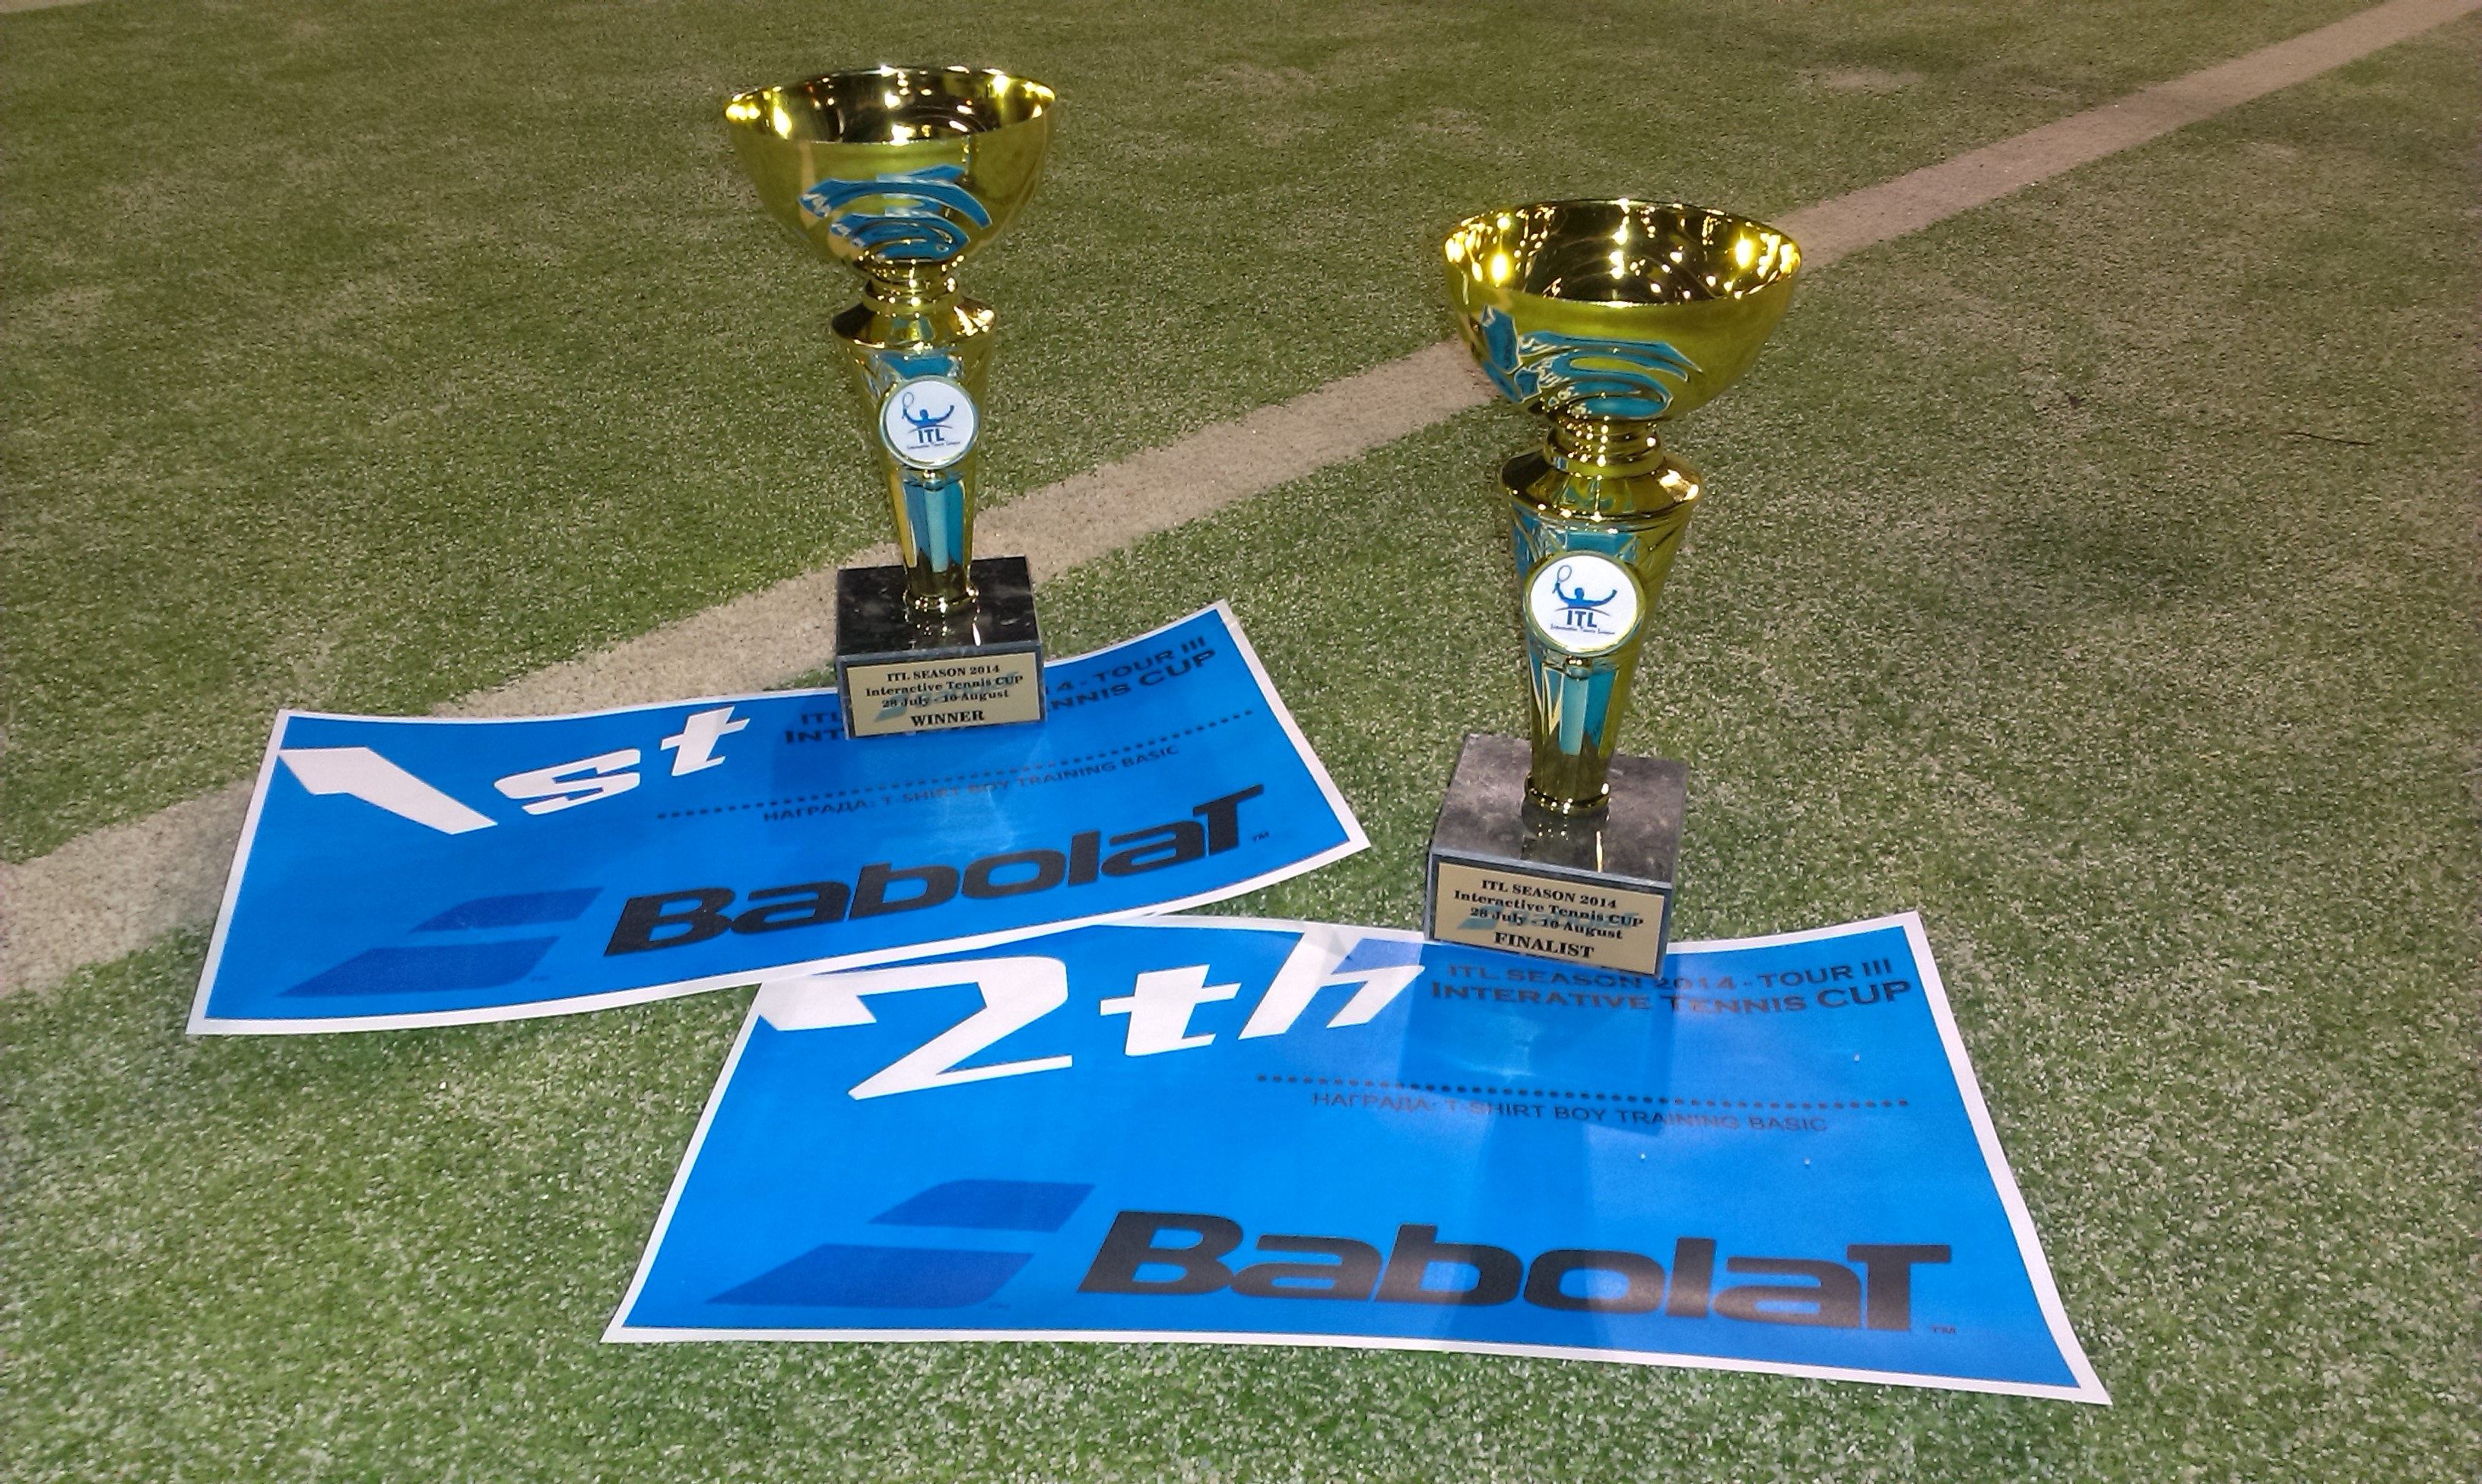 Interactive Tennis CUP има своя победител!